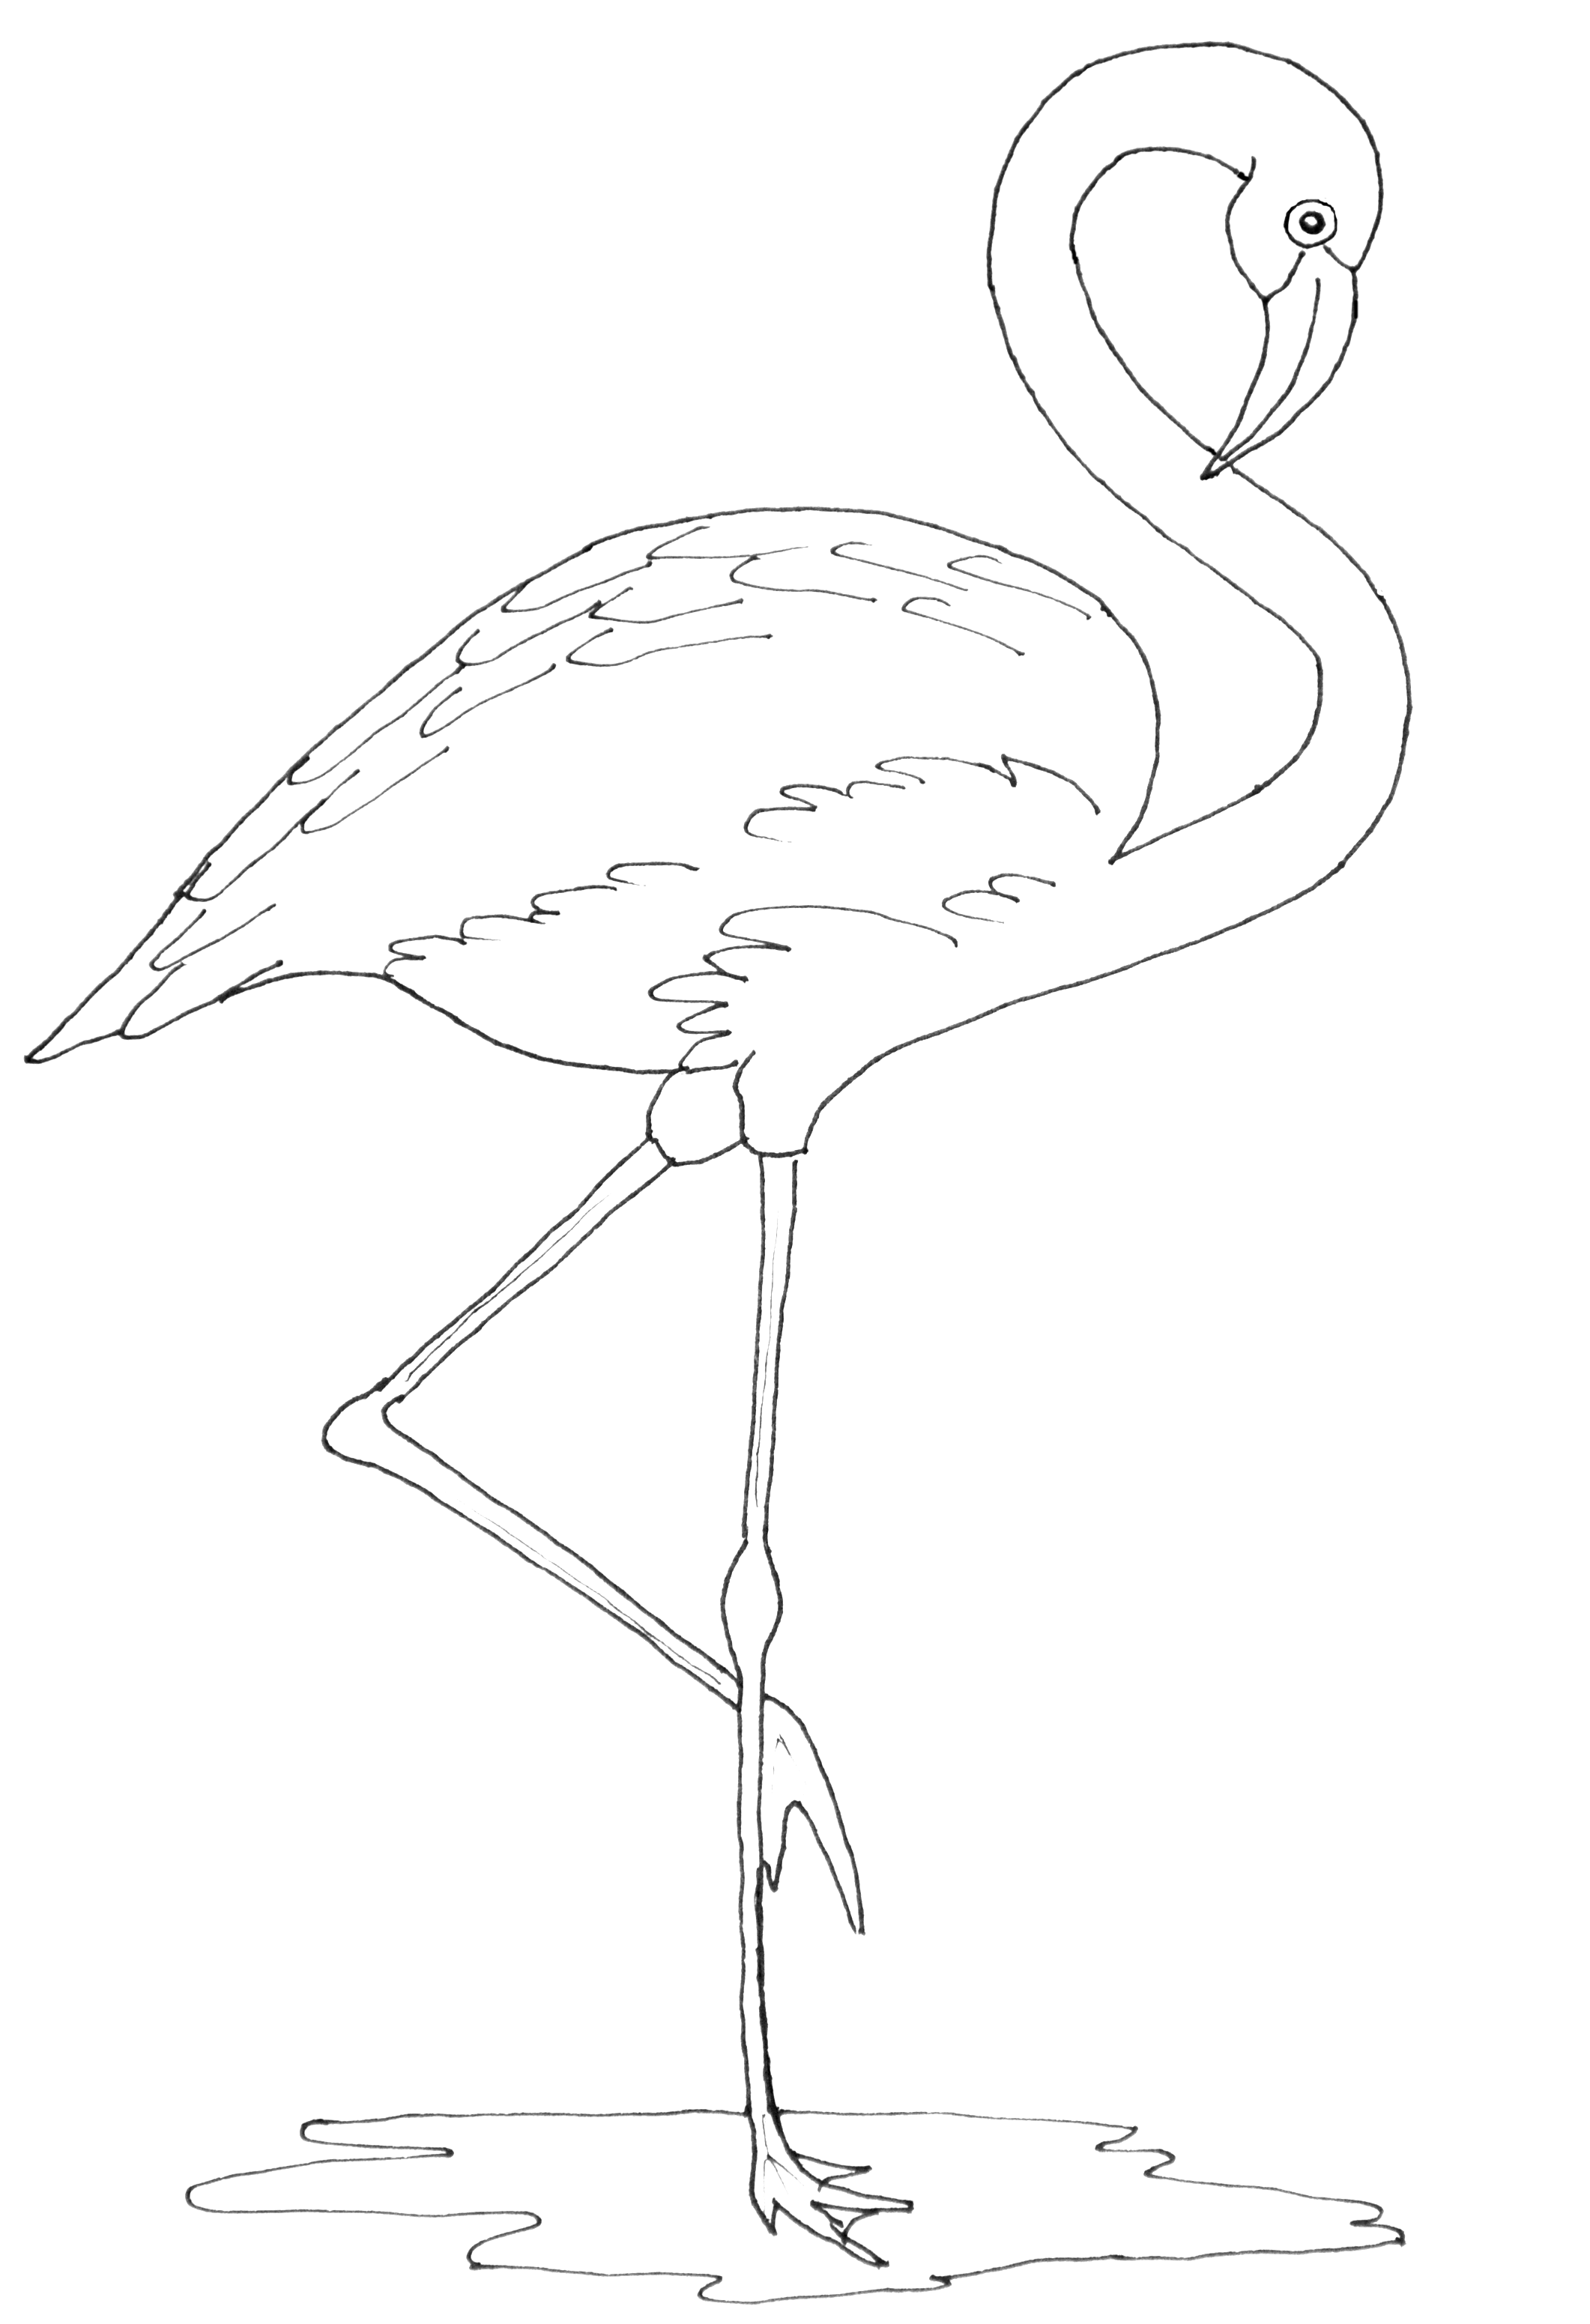 Malvorlage Flamingo Einfach - tiffanylovesbooks